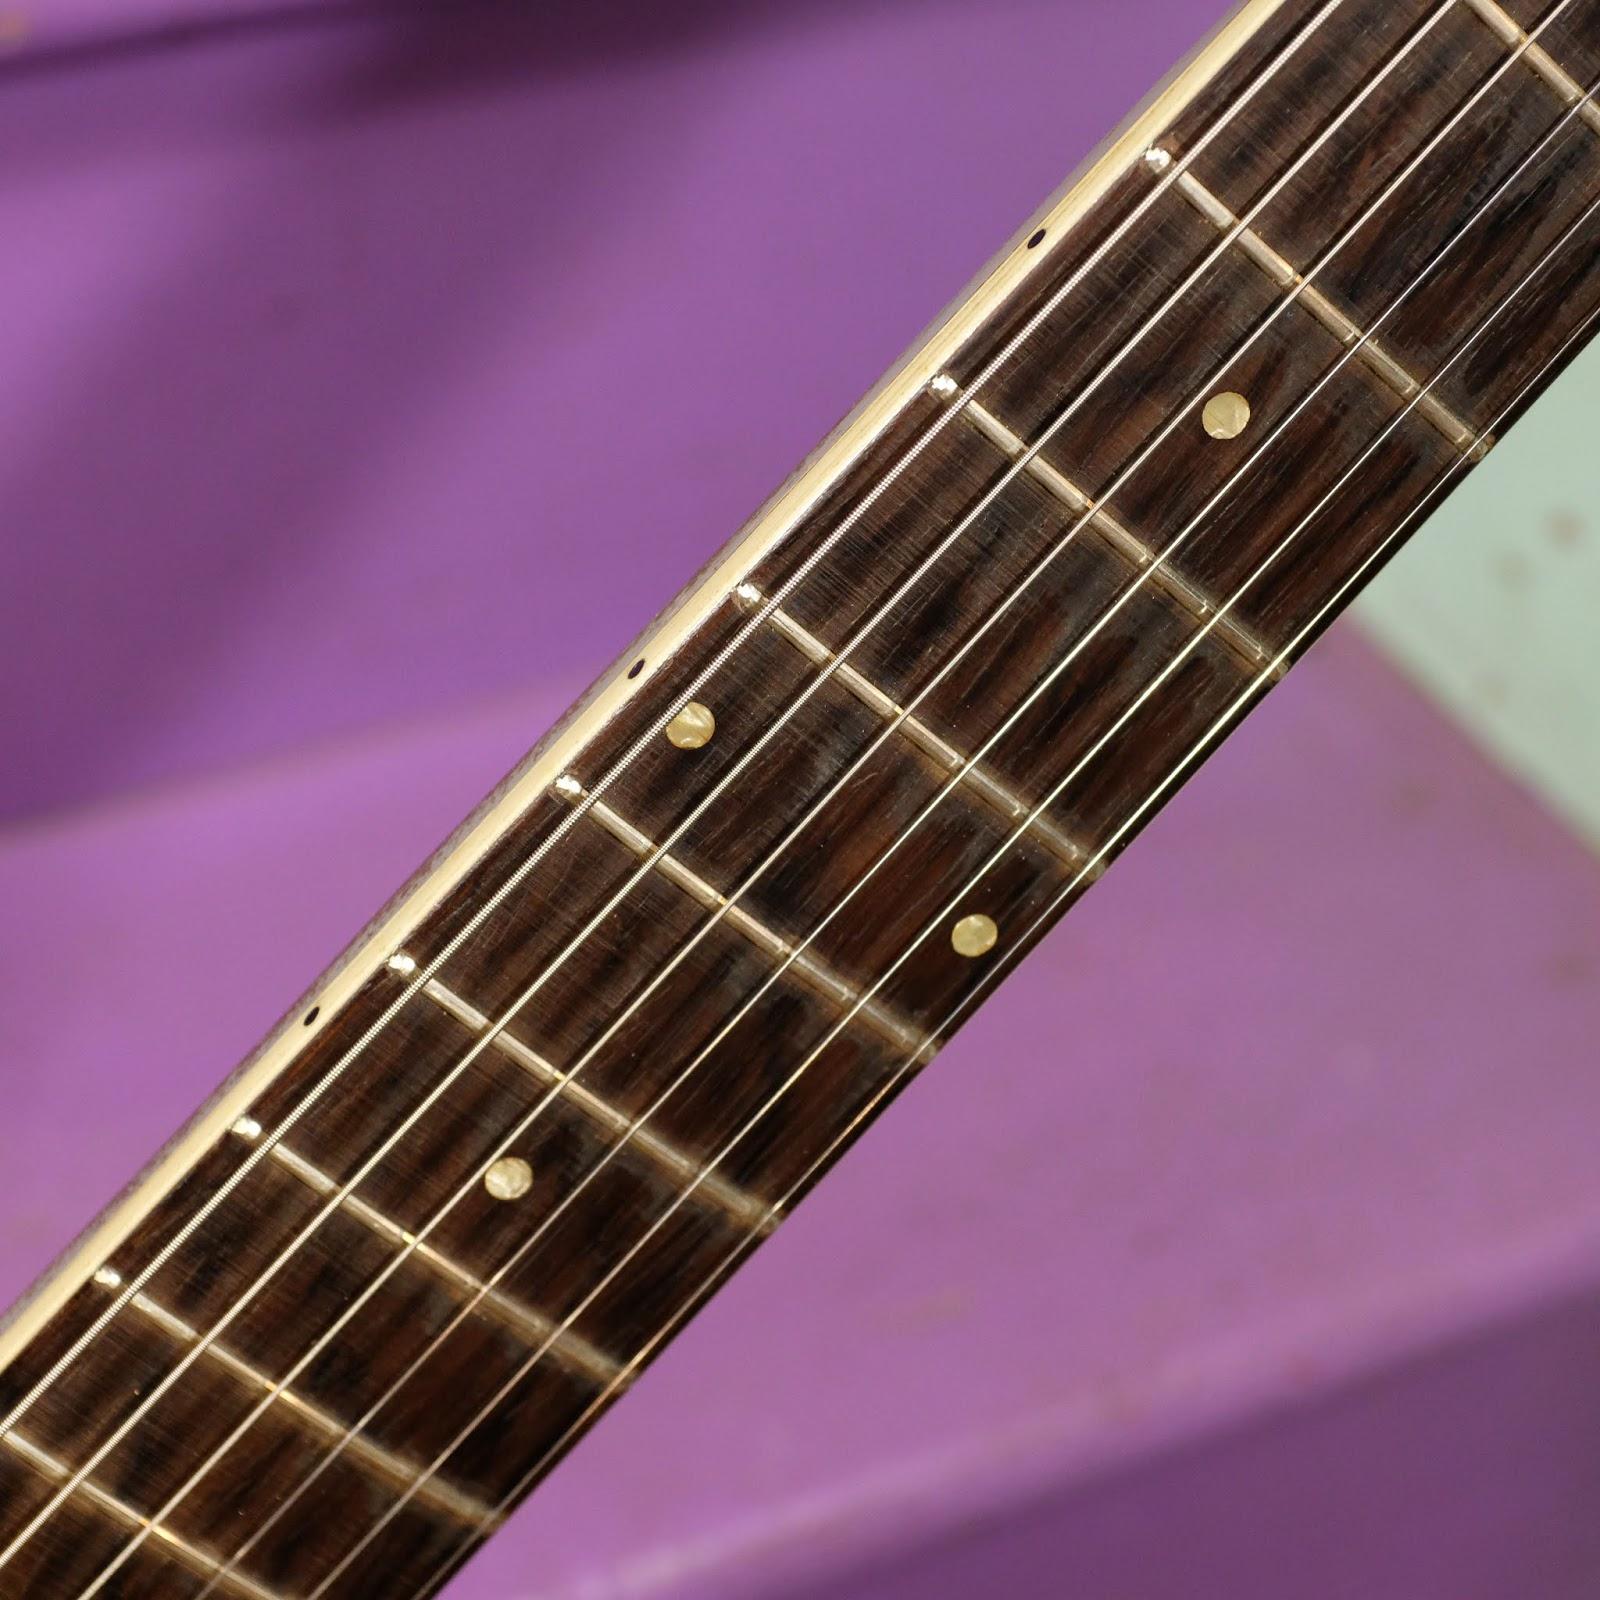 wiring diagram on harmony h78 harmony guitars 1950s harmony h44 stratotone electric guitar on harmony h78 harmony guitars harmony insurance  [ 1600 x 1600 Pixel ]